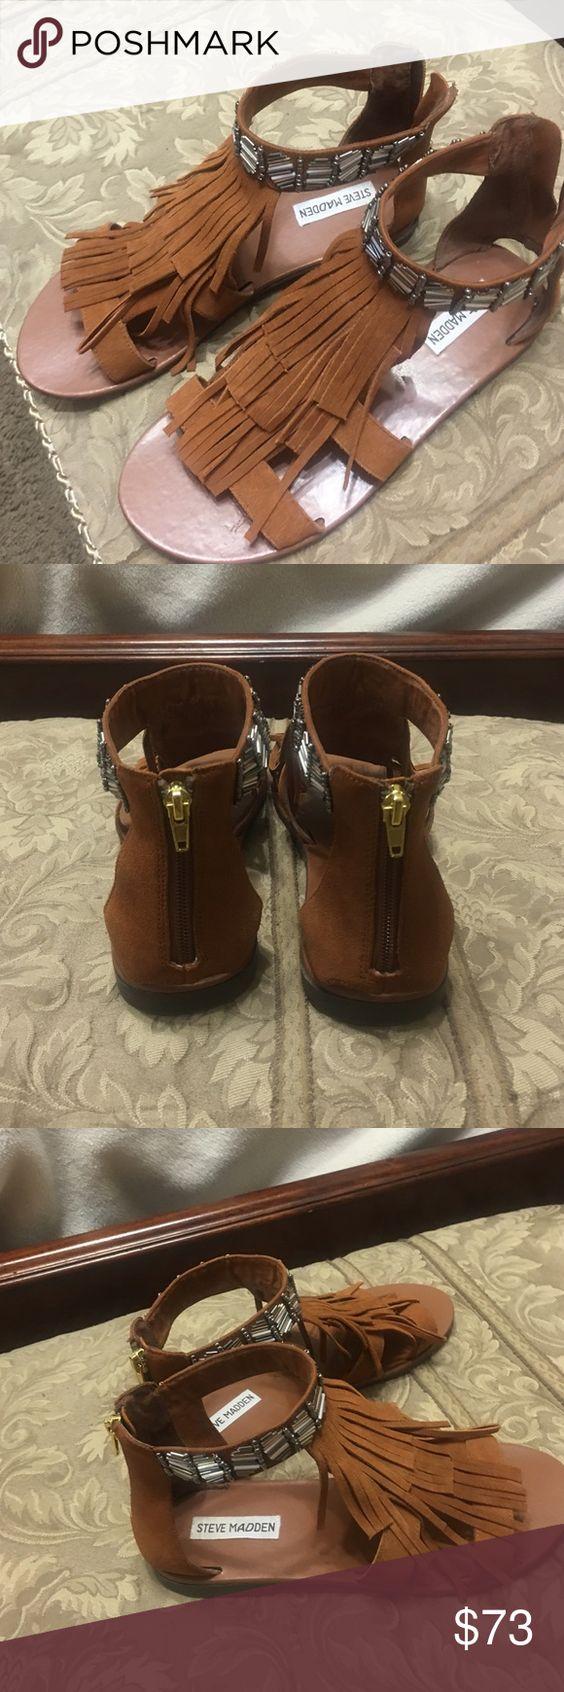 Fringe Tobacco color Sandals genuine suede Suede upper with detailed ankle back zipper gold Steve Madden Shoes Sandals